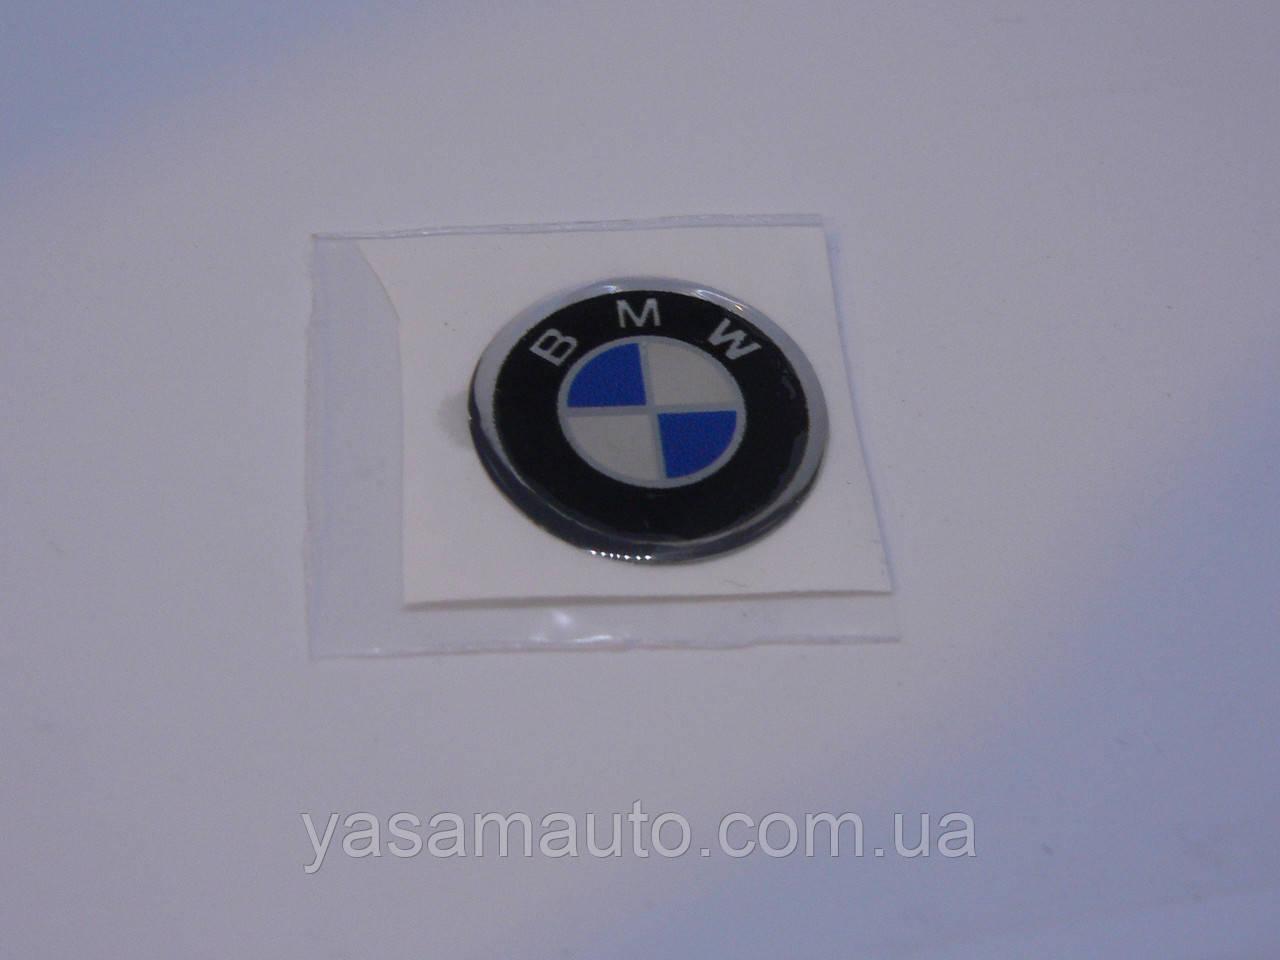 Наклейка s круглая BMW 20х20х1.2мм стандарт силиконовая эмблема логотип марка бренд в круге на авто 3М БМВ